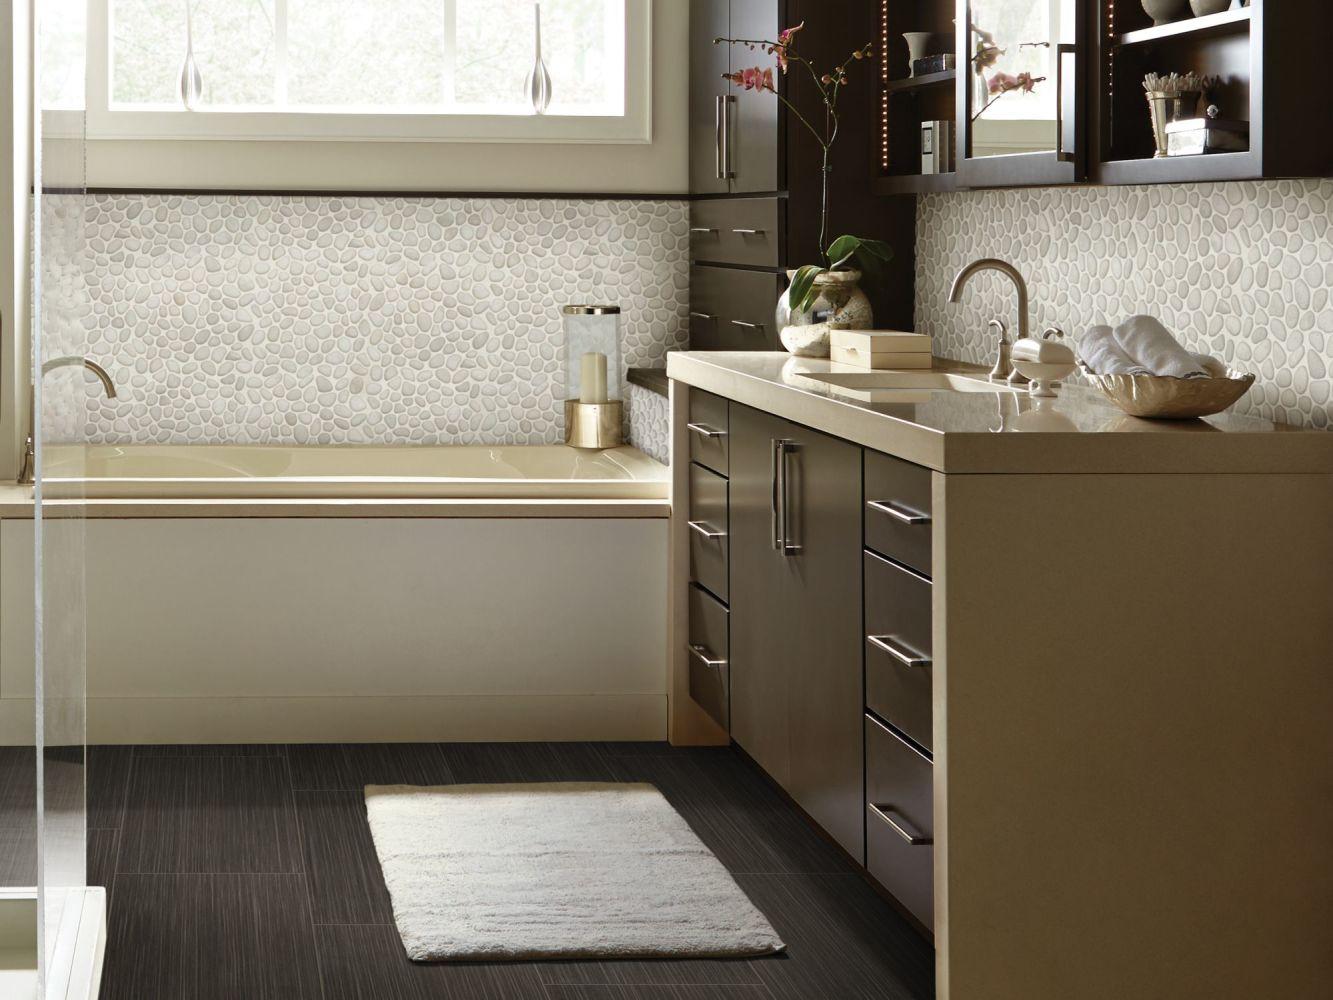 Shaw Floors Home Fn Gold Ceramic River Rock Honed Serenity 00111_TGL65